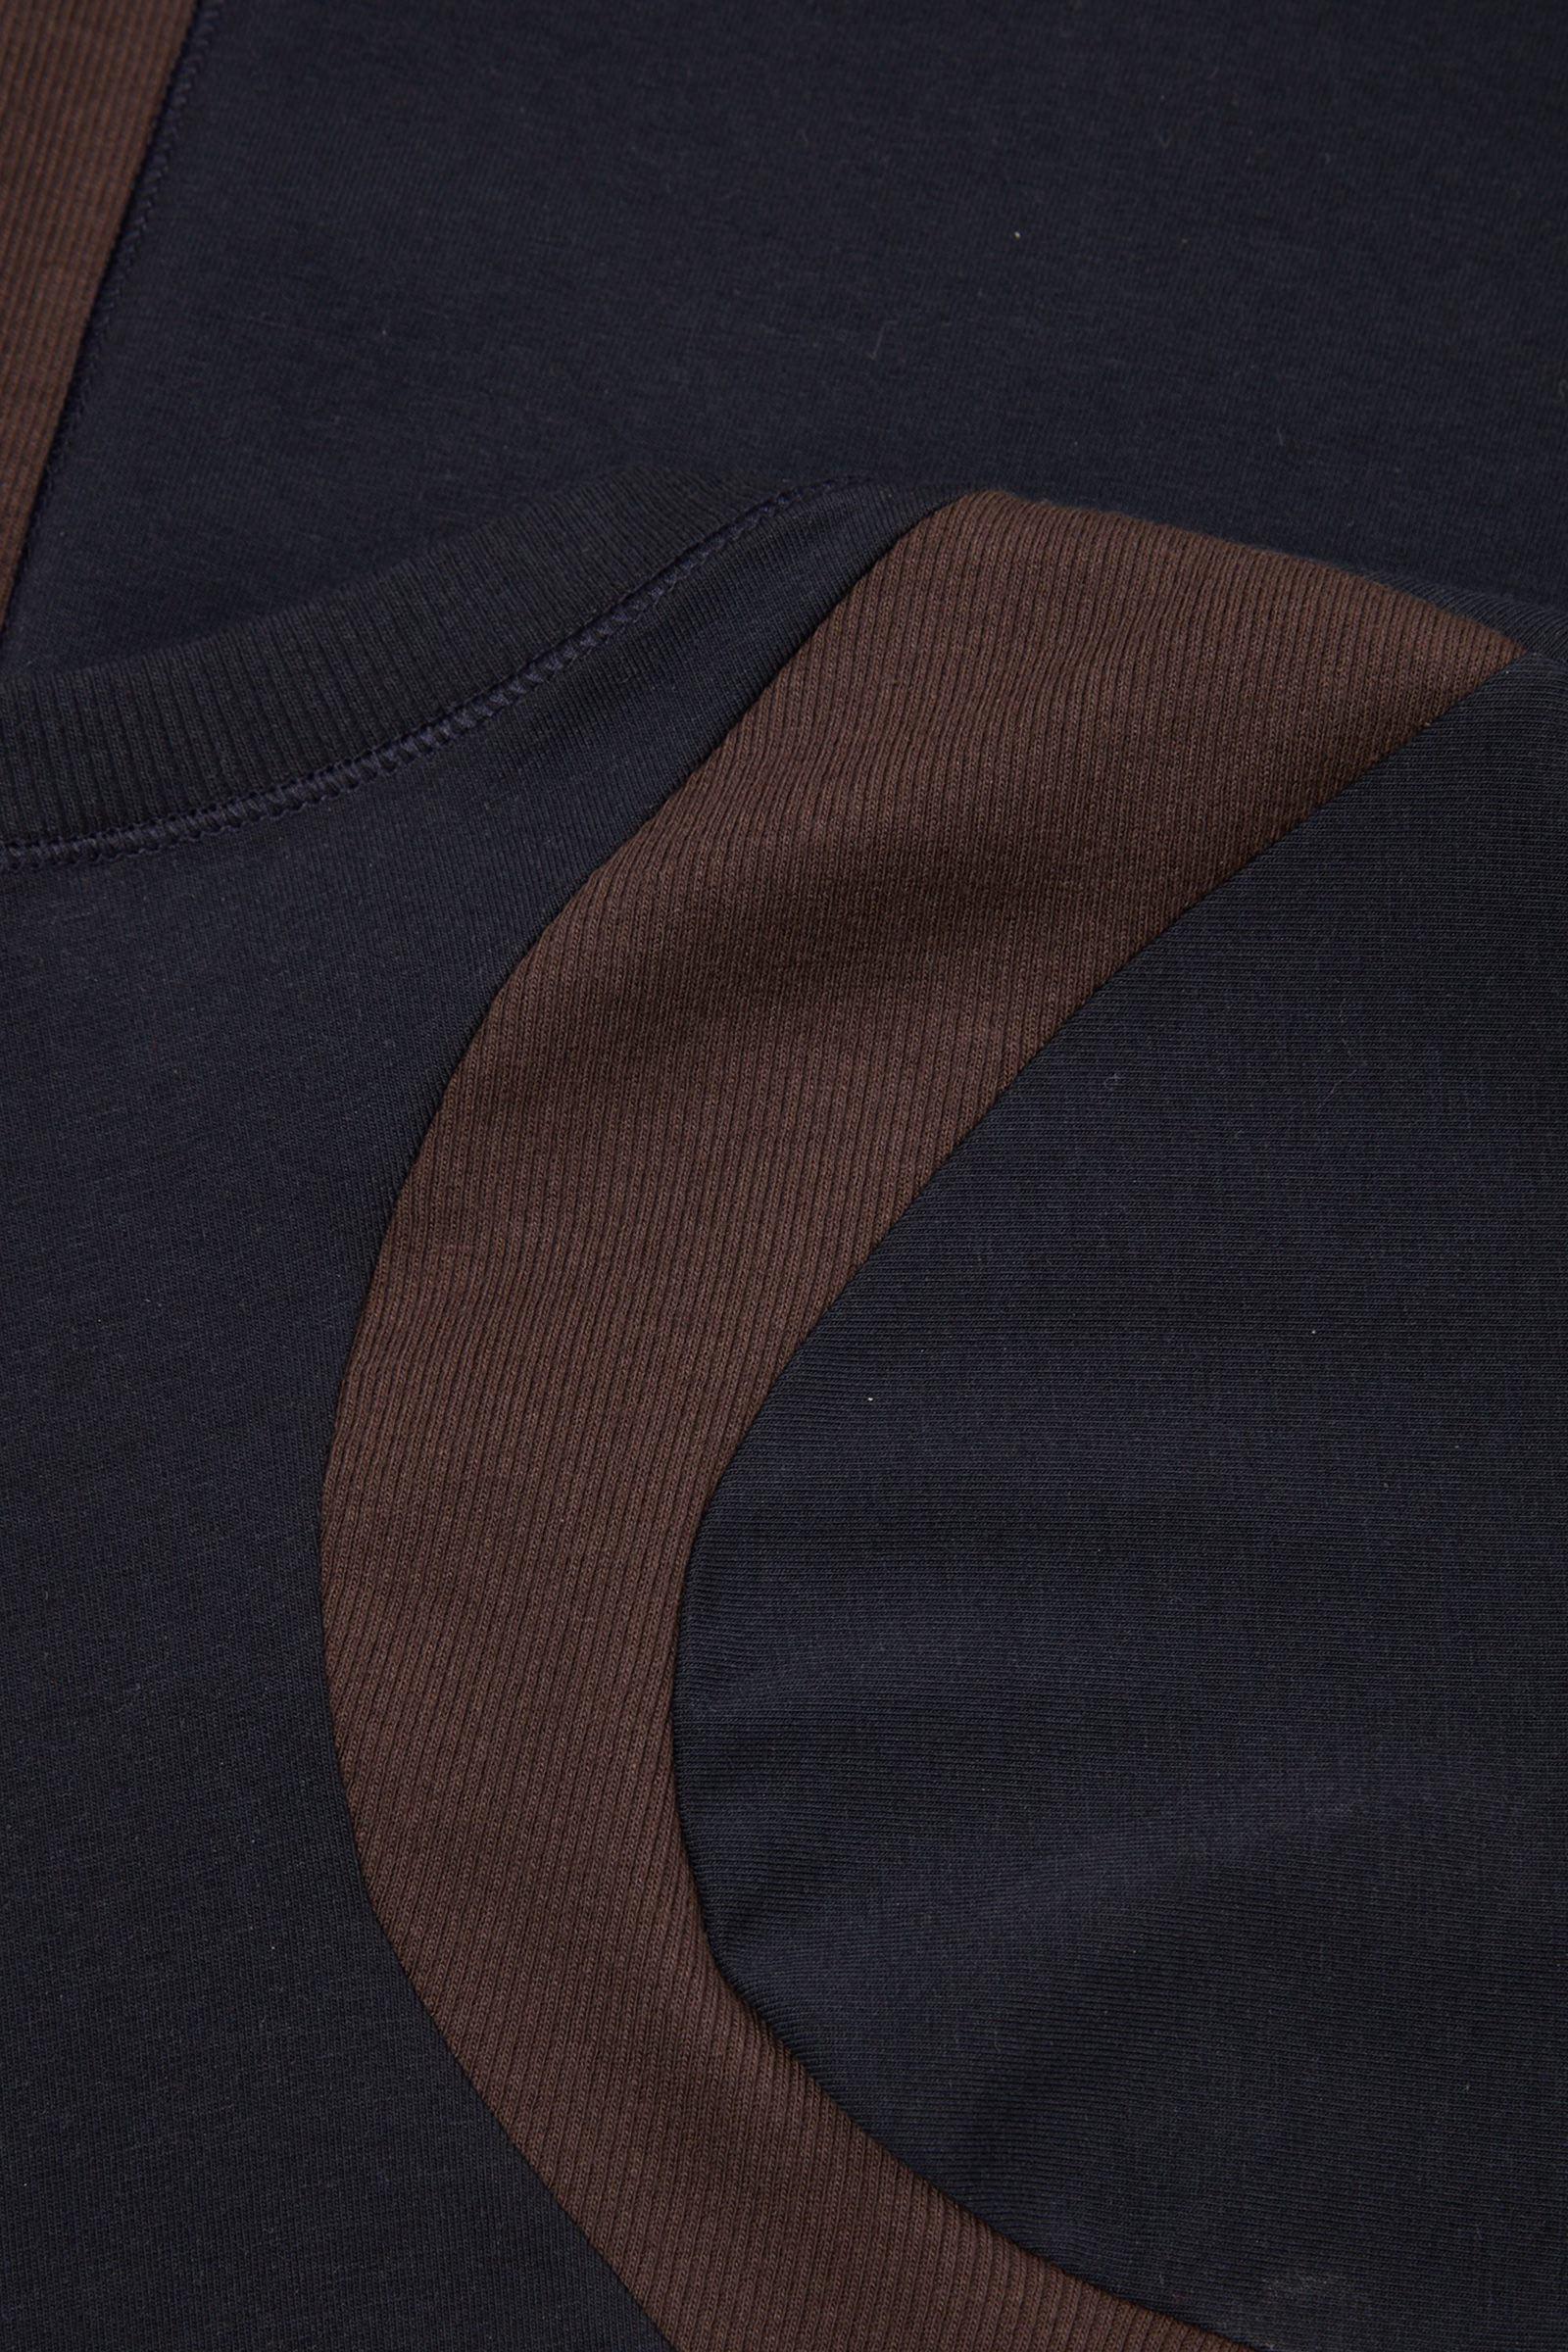 COS 슬림핏 오가닉 코튼 컨투어드 탑의 네이비 / 브라운컬러 Detail입니다.